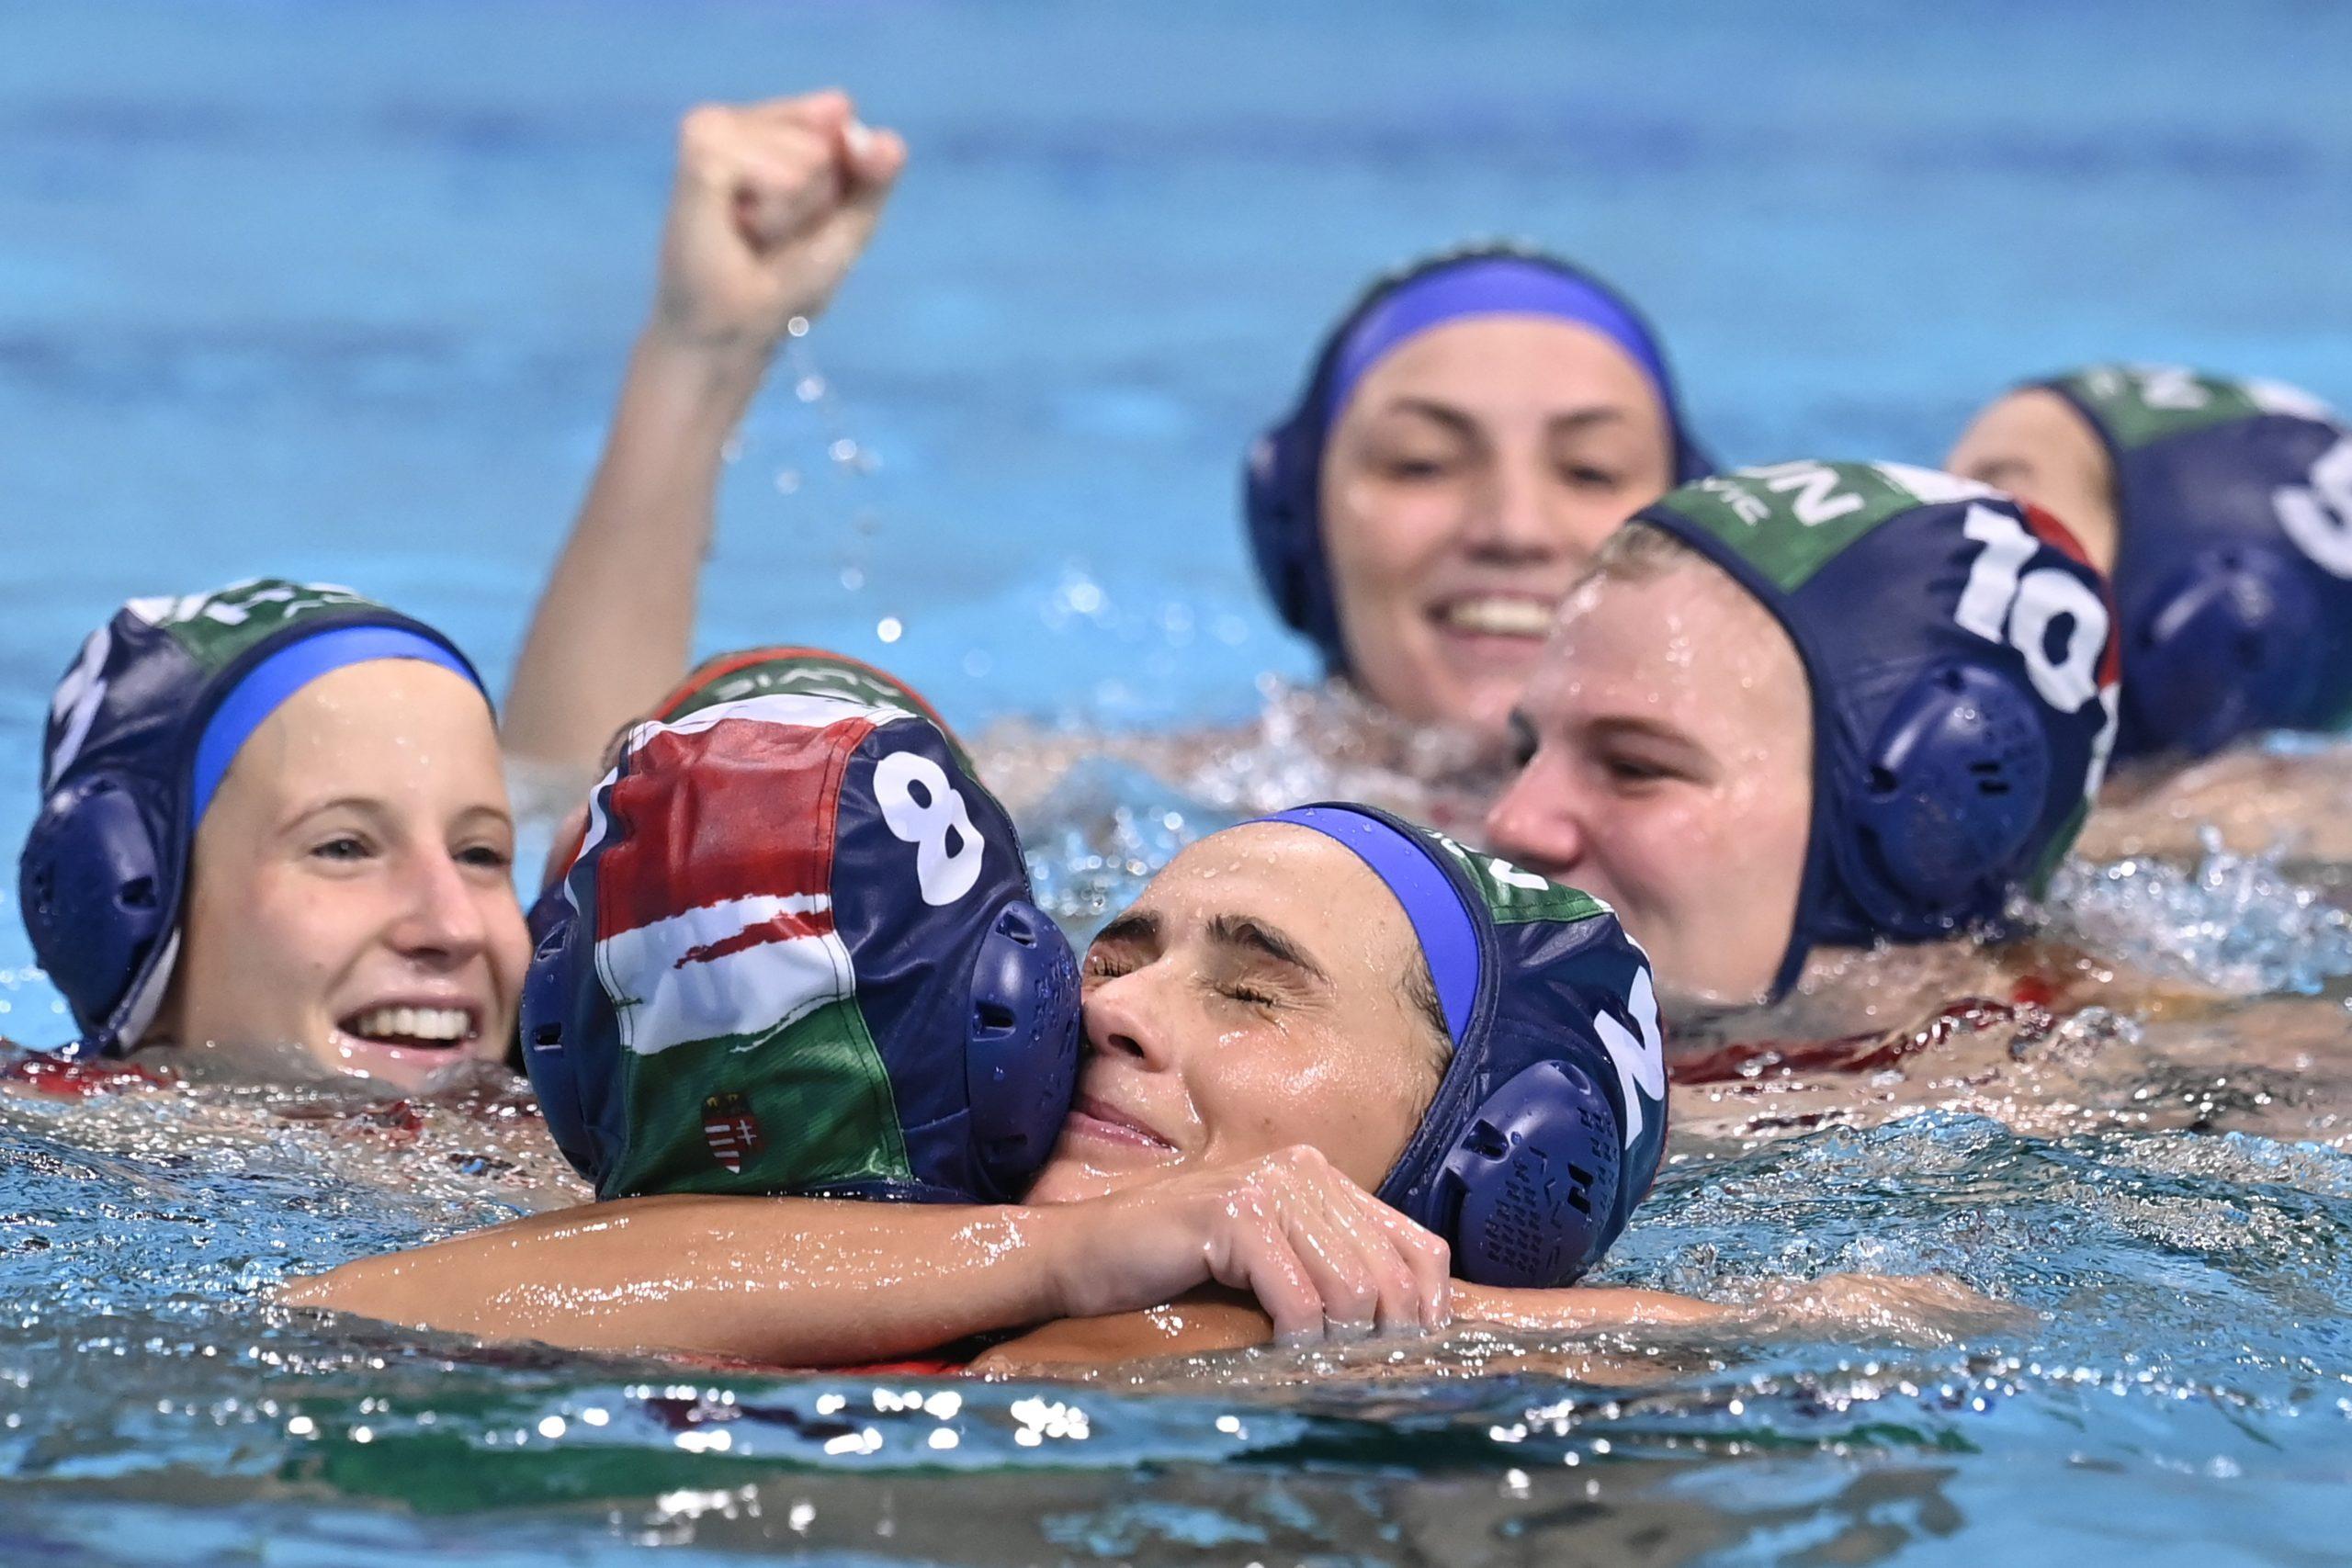 Tokyo 2020: Hungarian Women's Waterpolo Team Reaches Semi-Finals